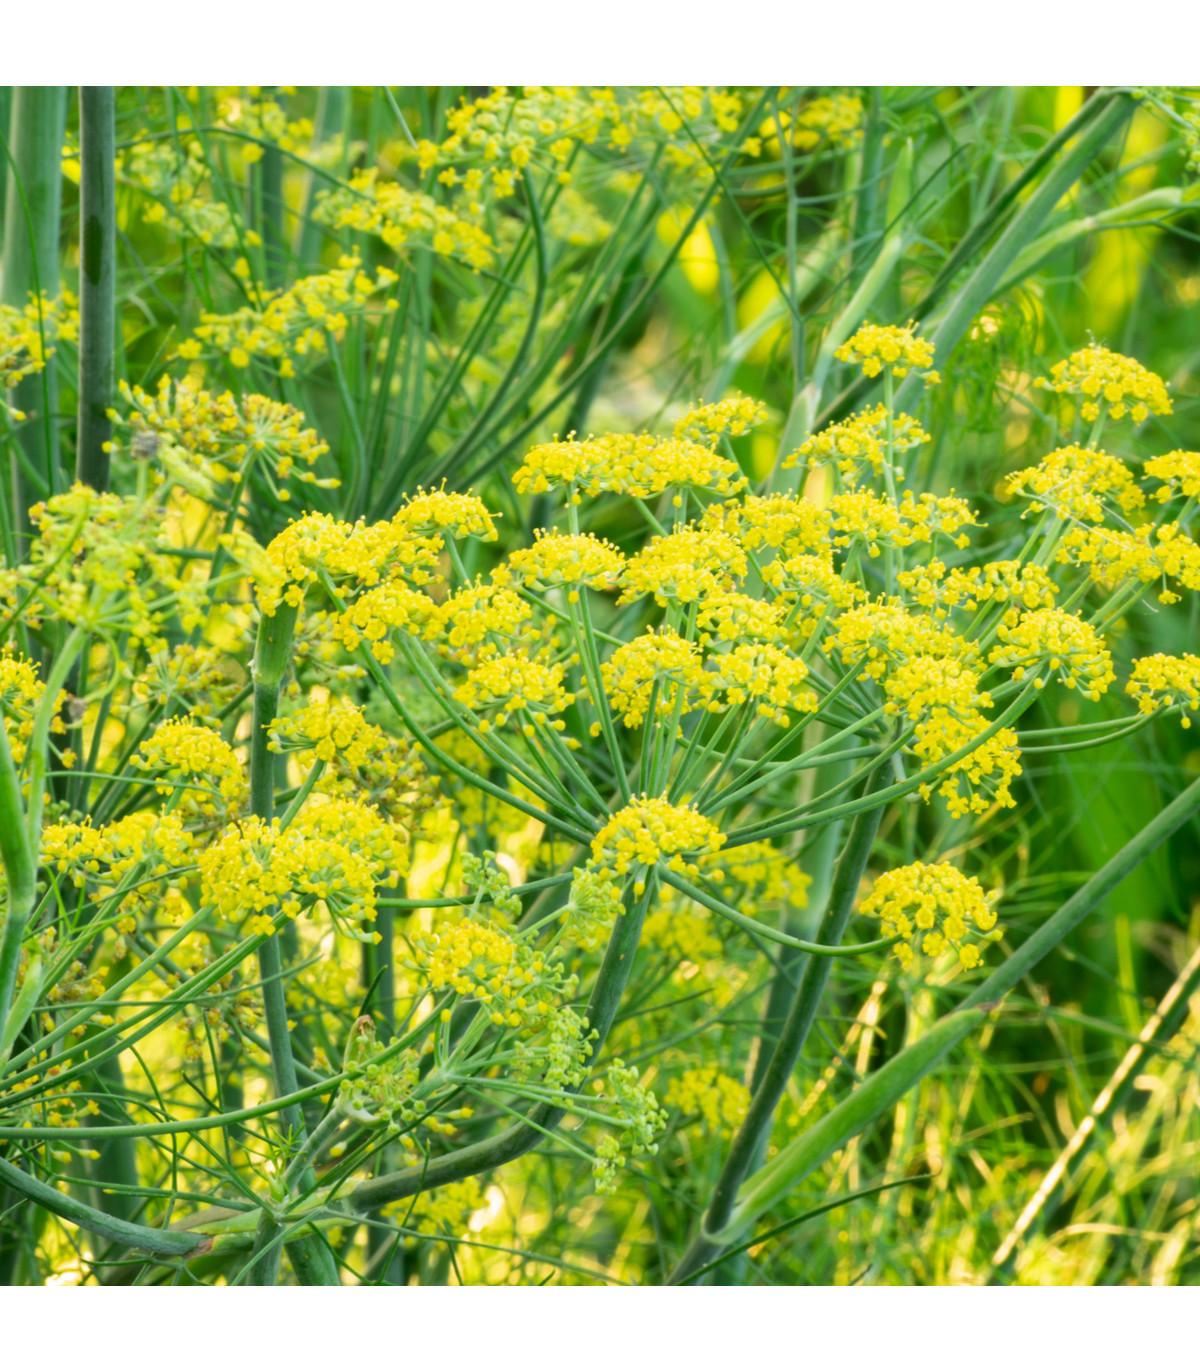 BIO fenikel koreninový - bio semená Fenikla - Foeniculum ssp. - 0,3 g